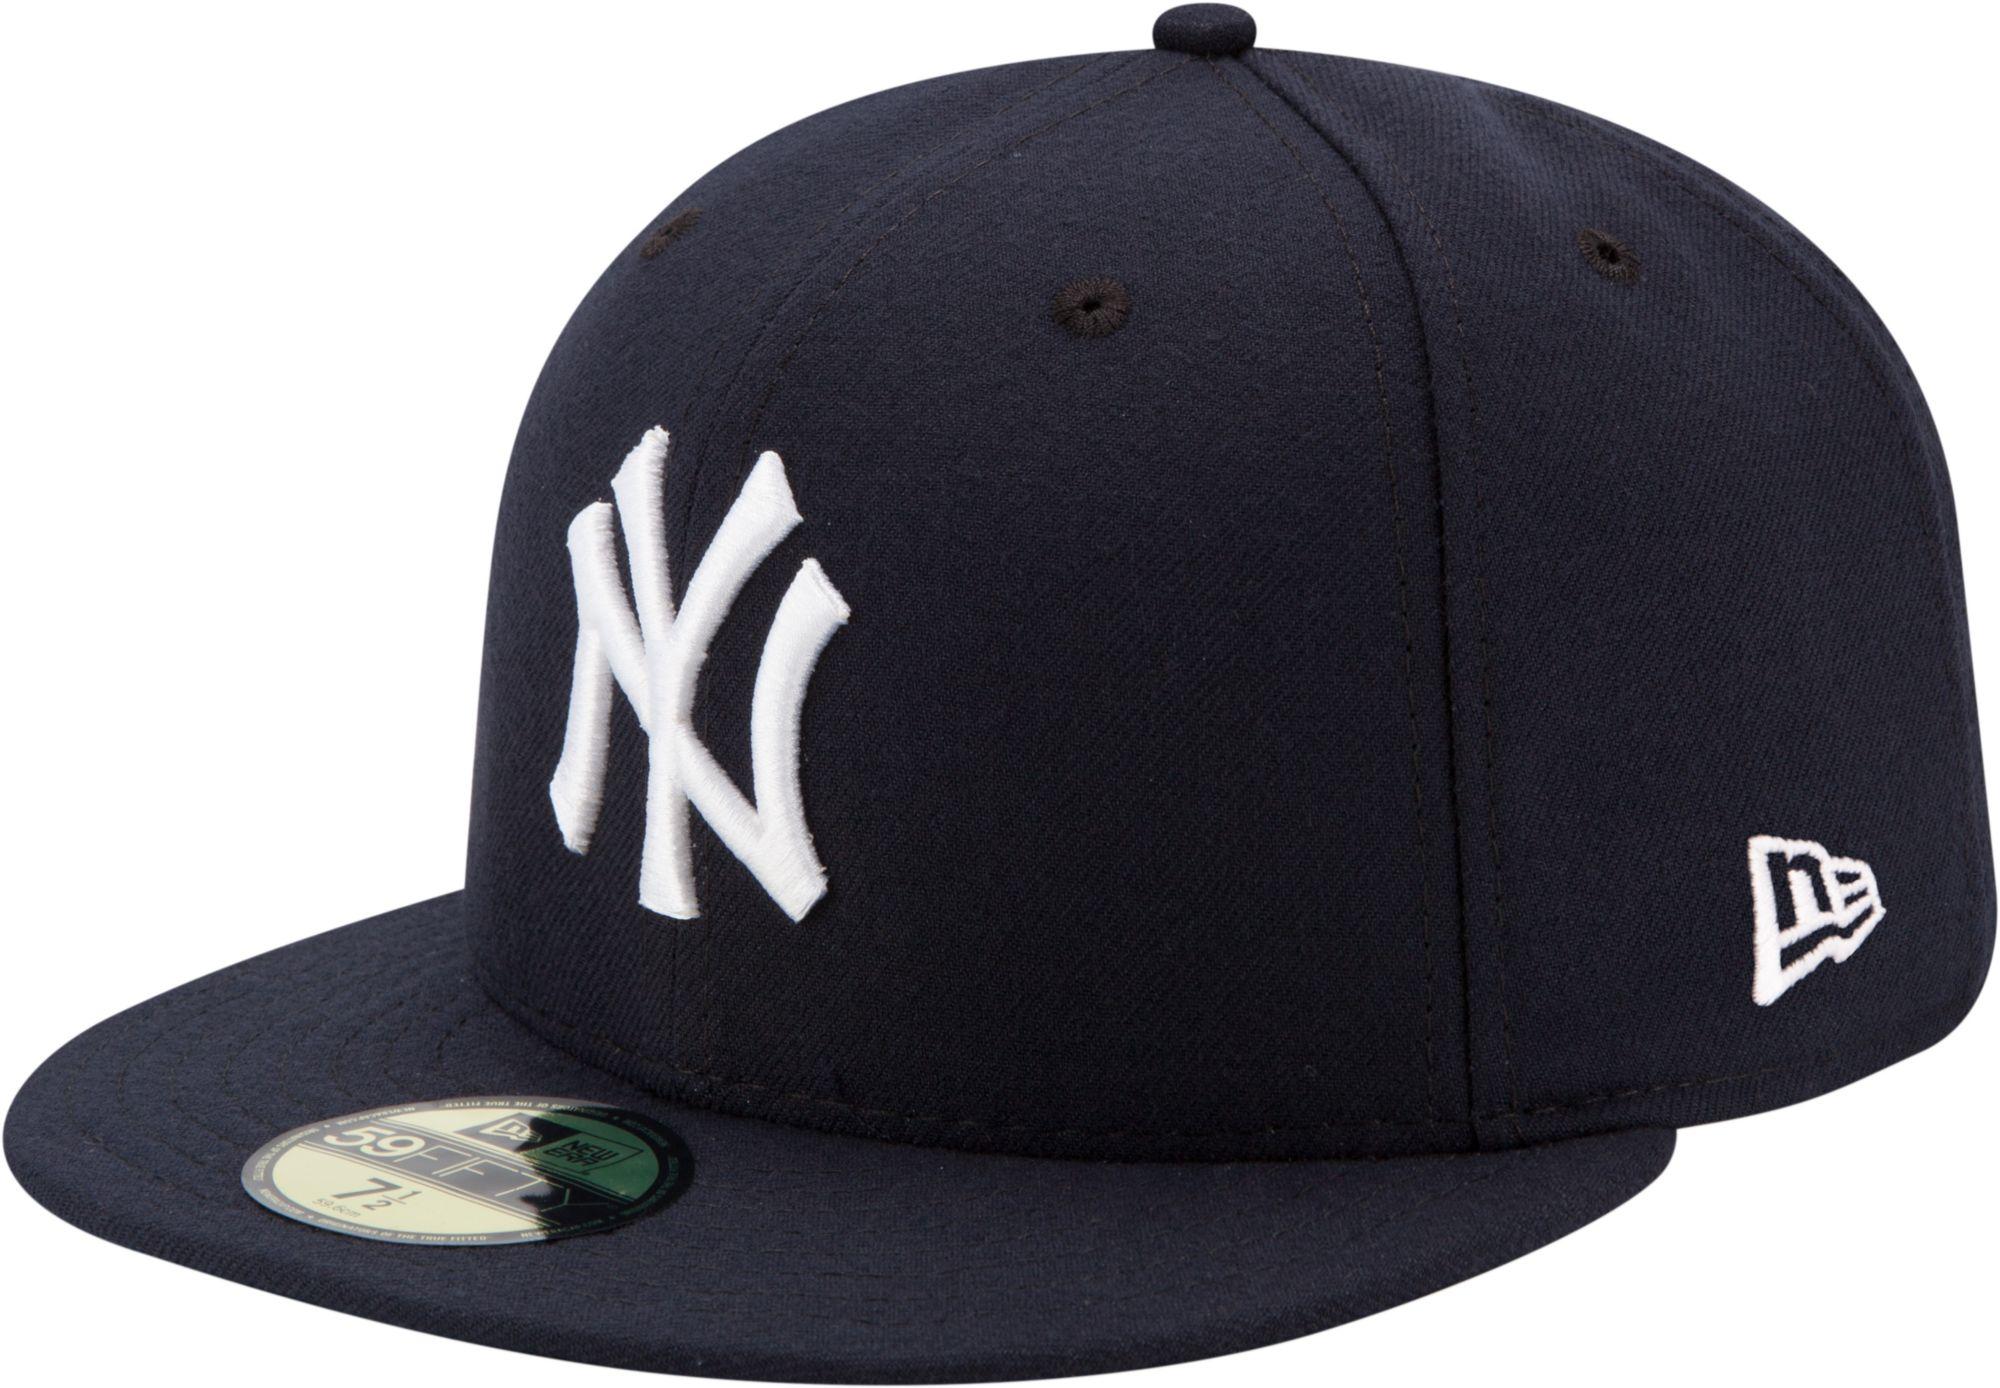 dicks sporting goods hats